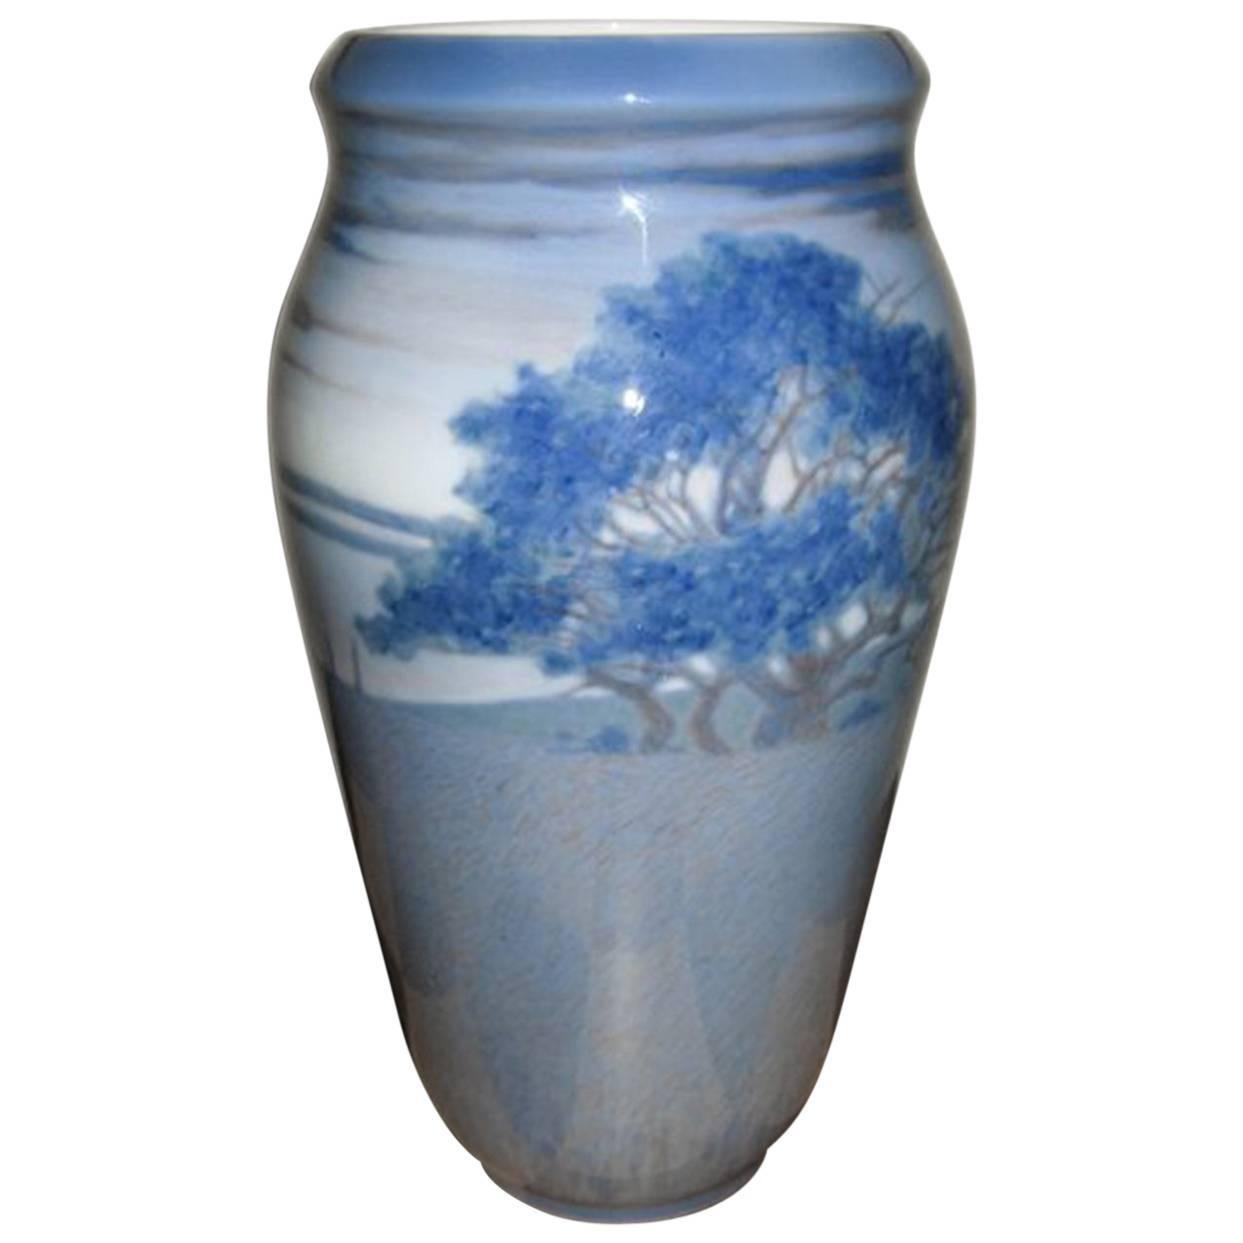 Royal Copenhagen Unique Vase by Anna Smidth from 1914